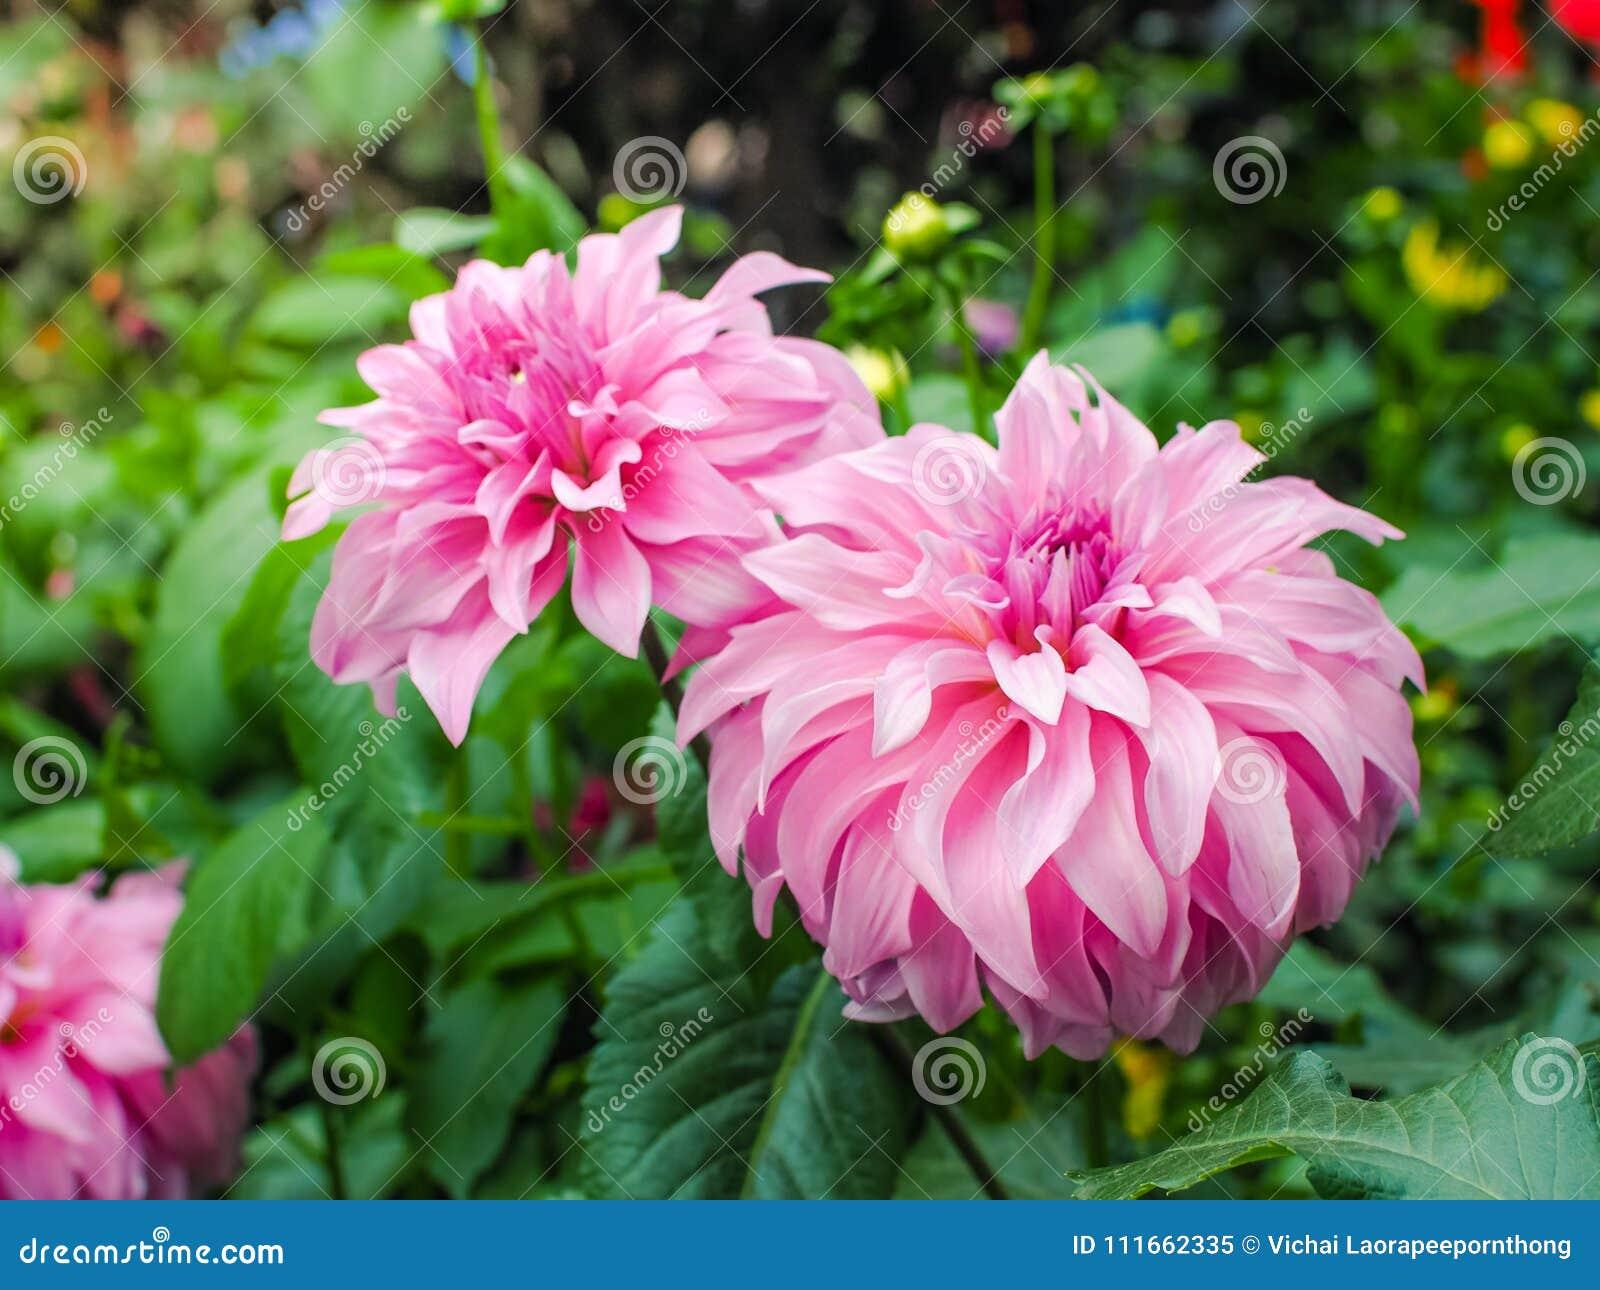 Beautiful Pink Dahlia Flower In Garden Stock Image Image Of